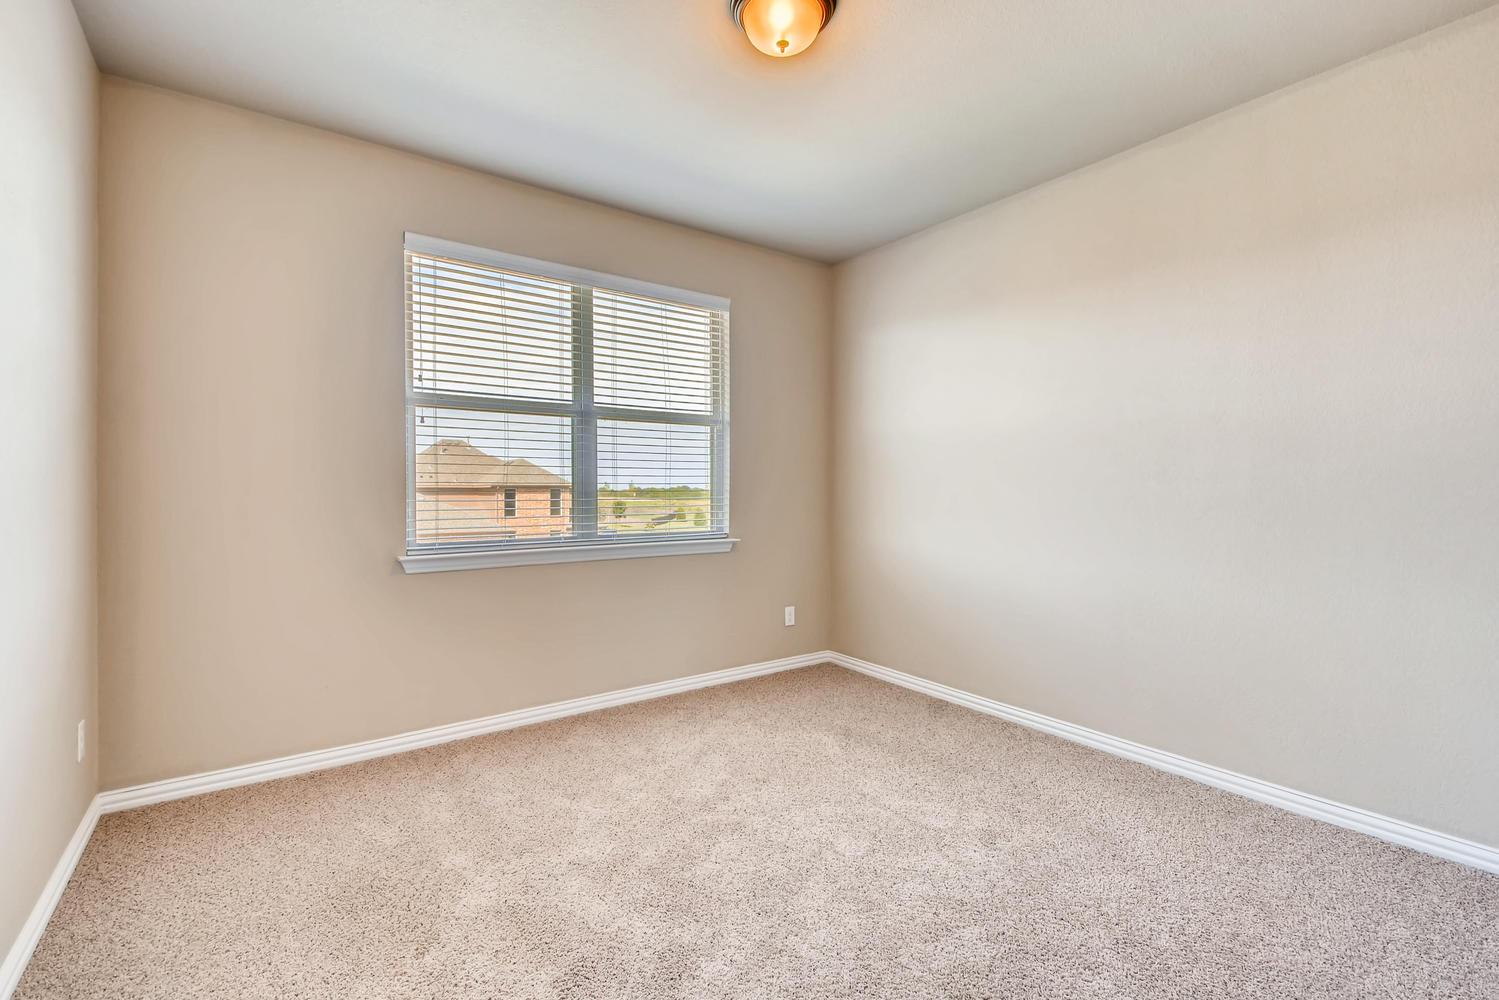 Photo of 369 Ash Brook Lane, Sunnyvale, TX, 75182